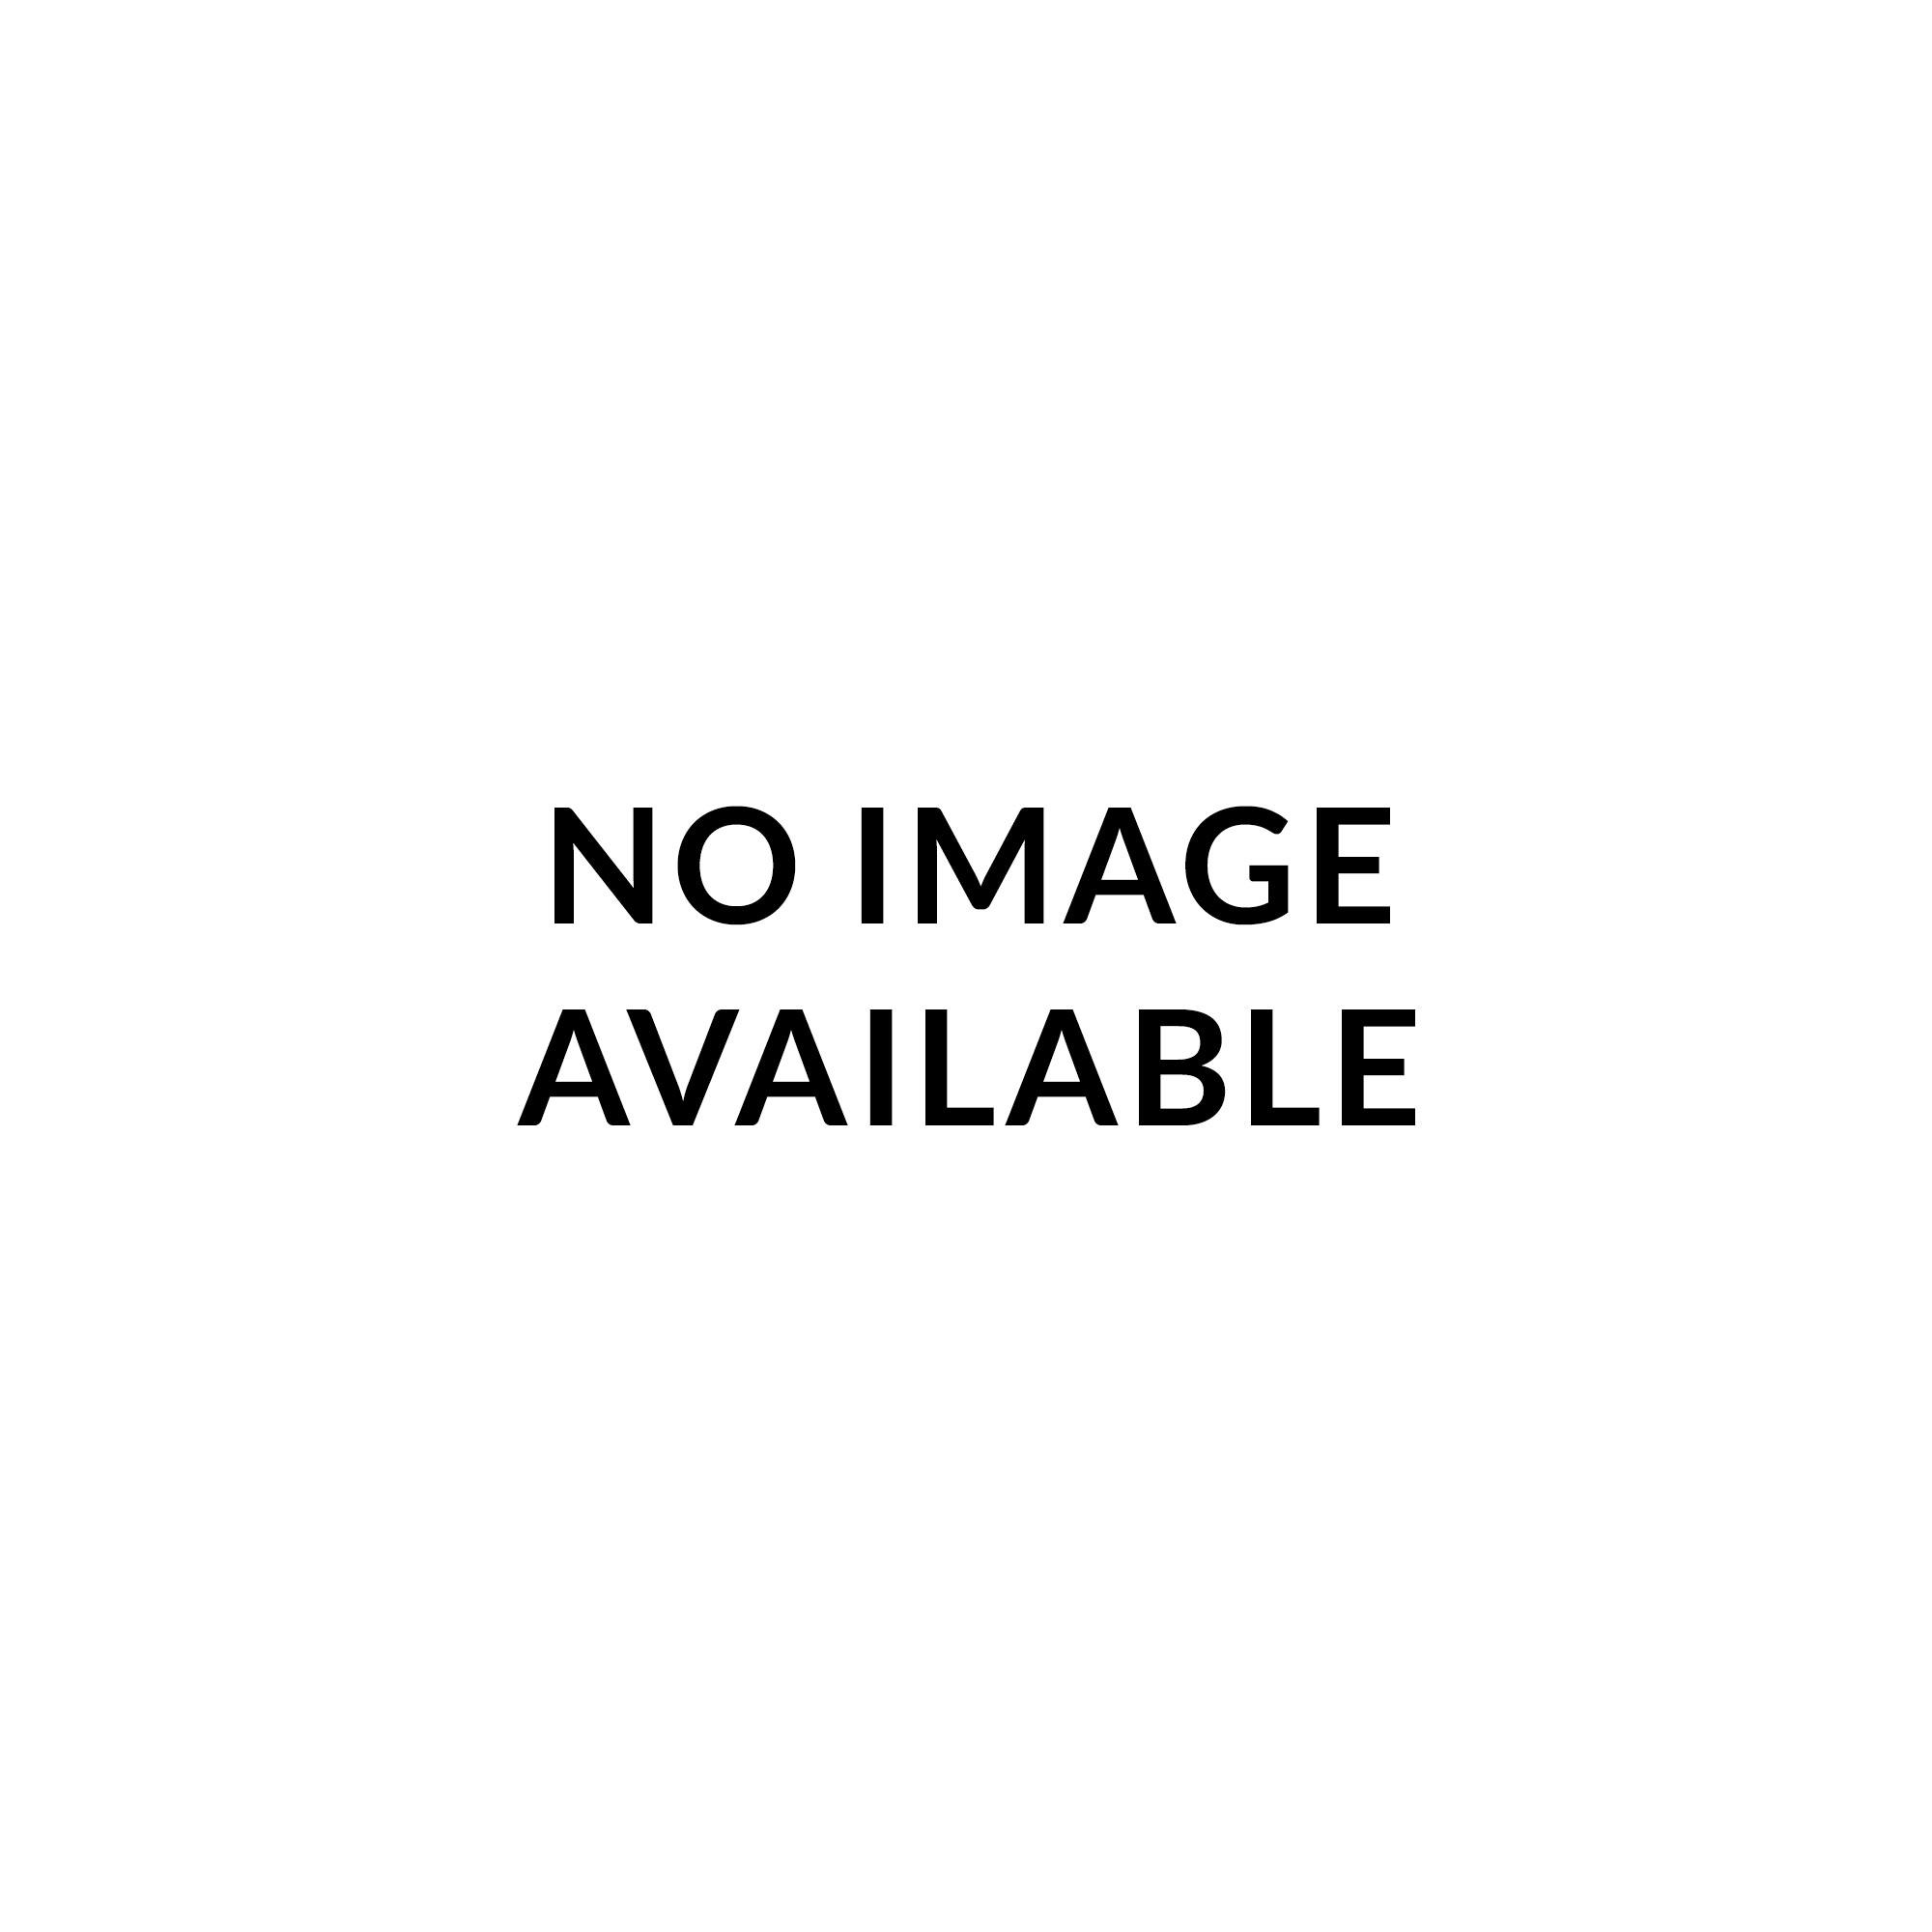 D'Addario PB052 Phosphor Bronze Acoustic Guitar Single String .052